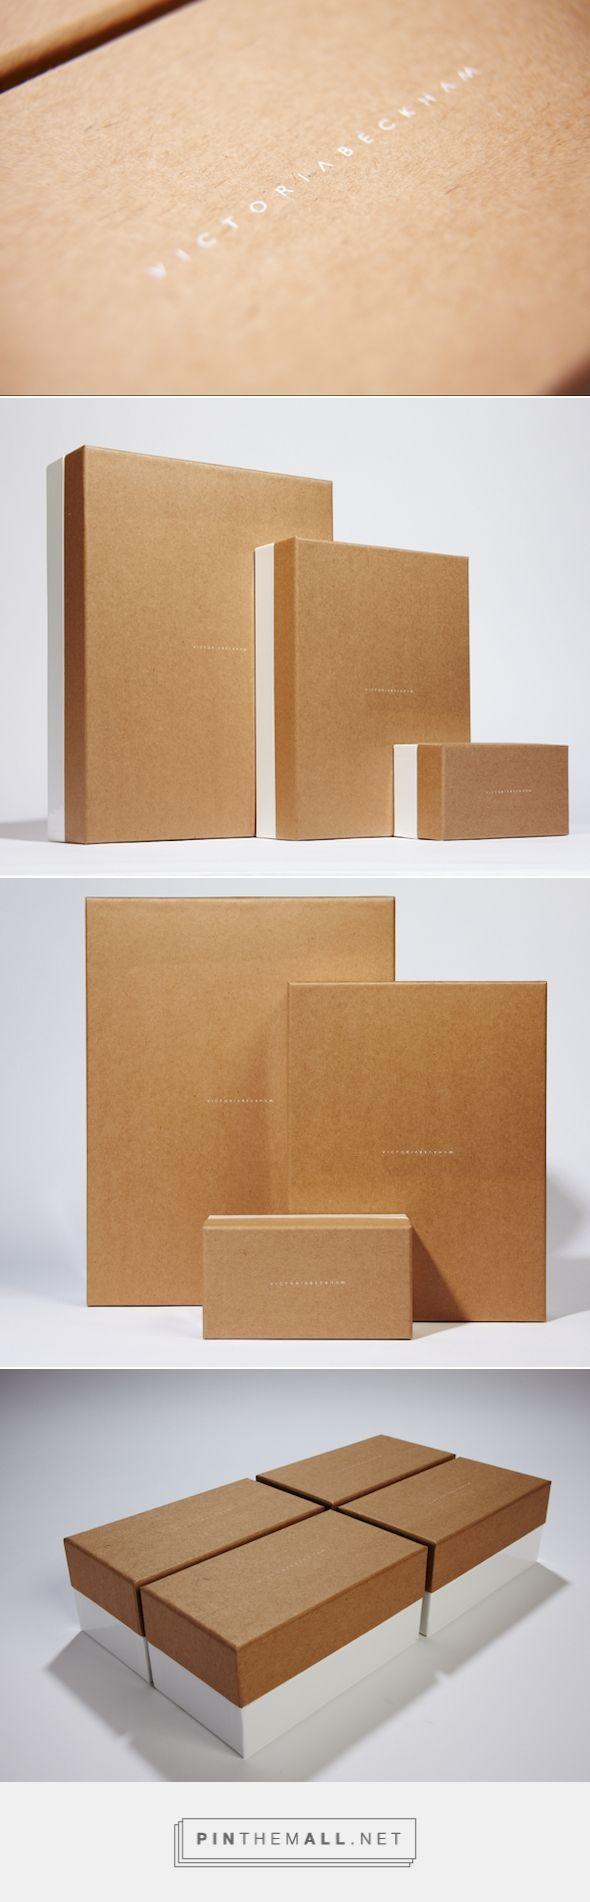 Victoria Beckham packaging box